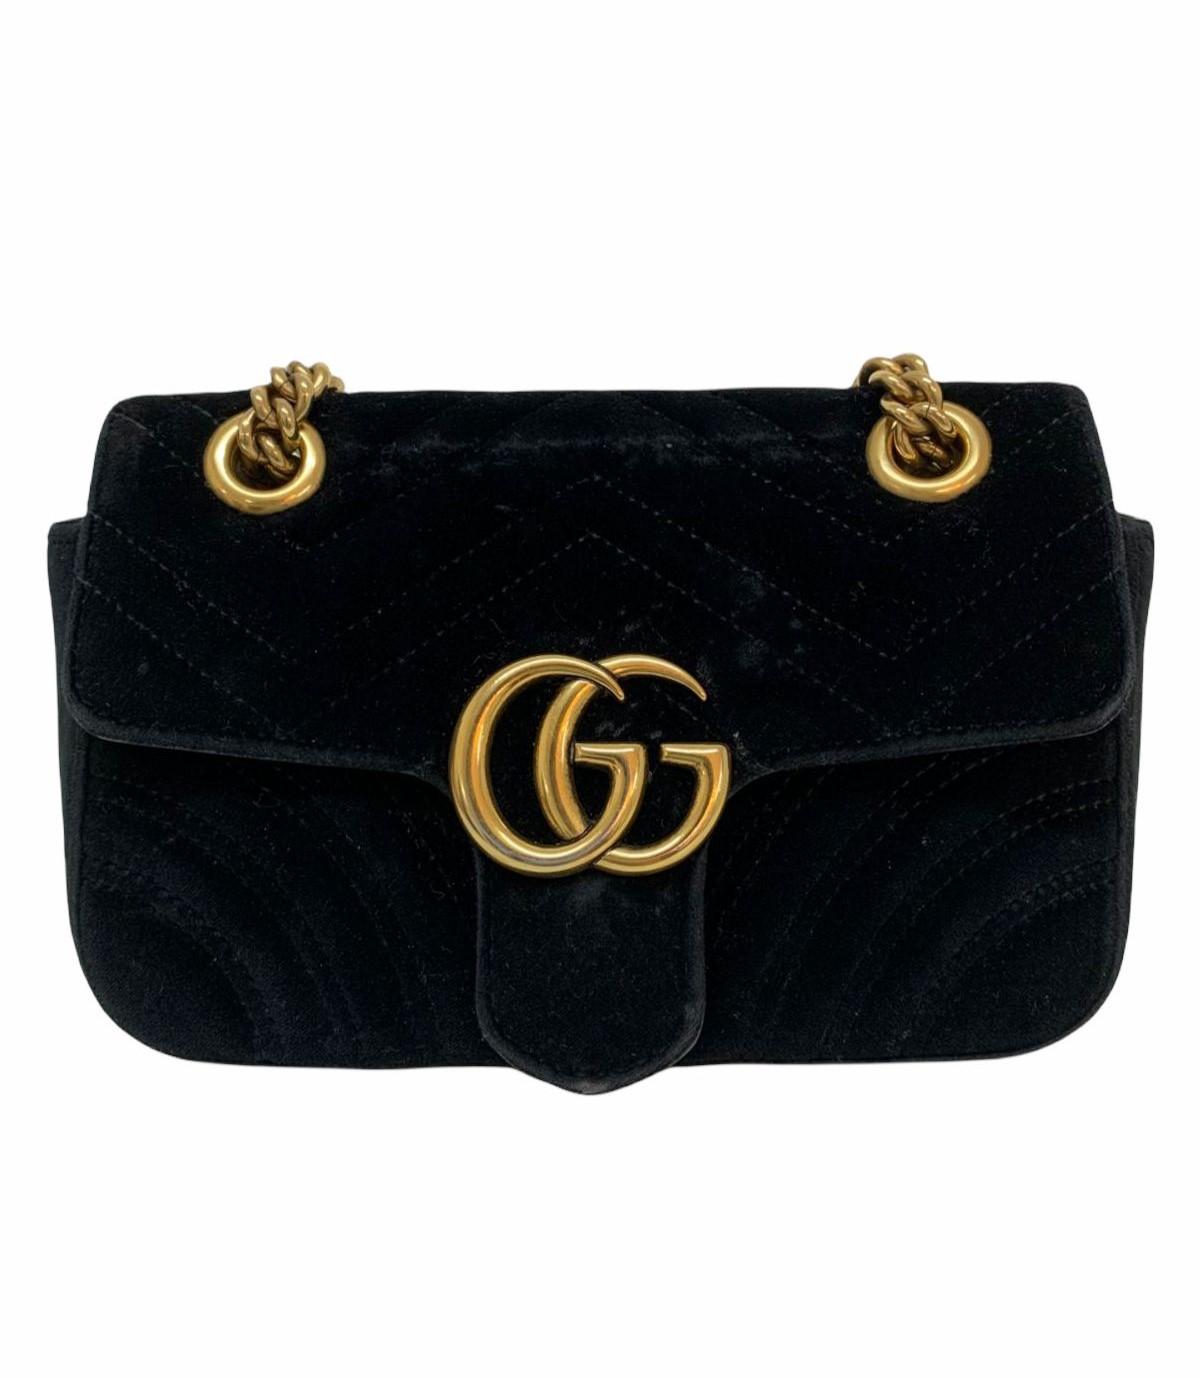 Bolsa Gucci GG Marmont Matelassé Velvet Preta